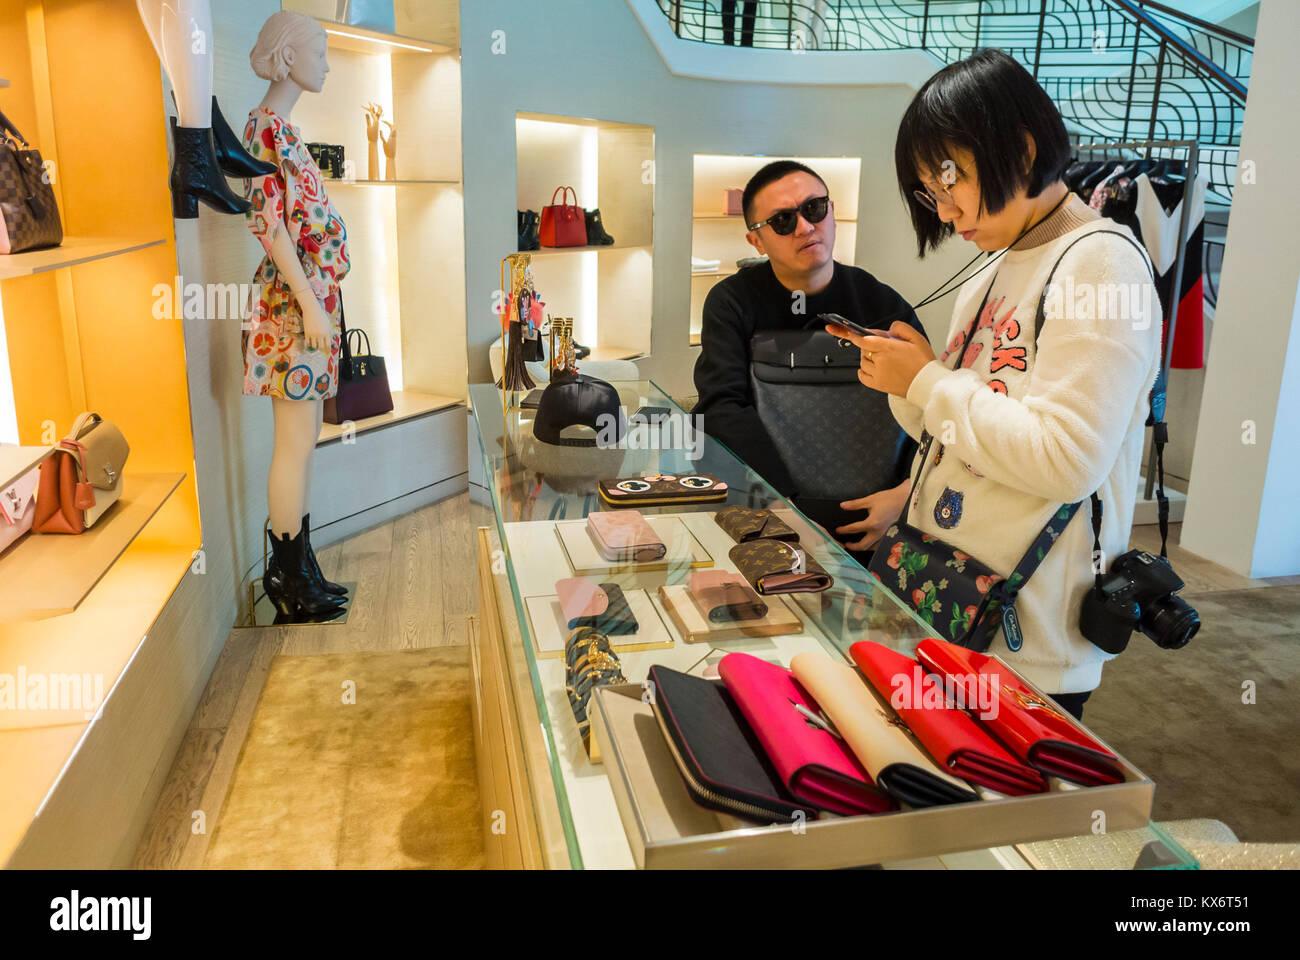 Monaco, Monte Carlo, Les Pavillions, Luxury Shops, Shopping Center - Stock Image